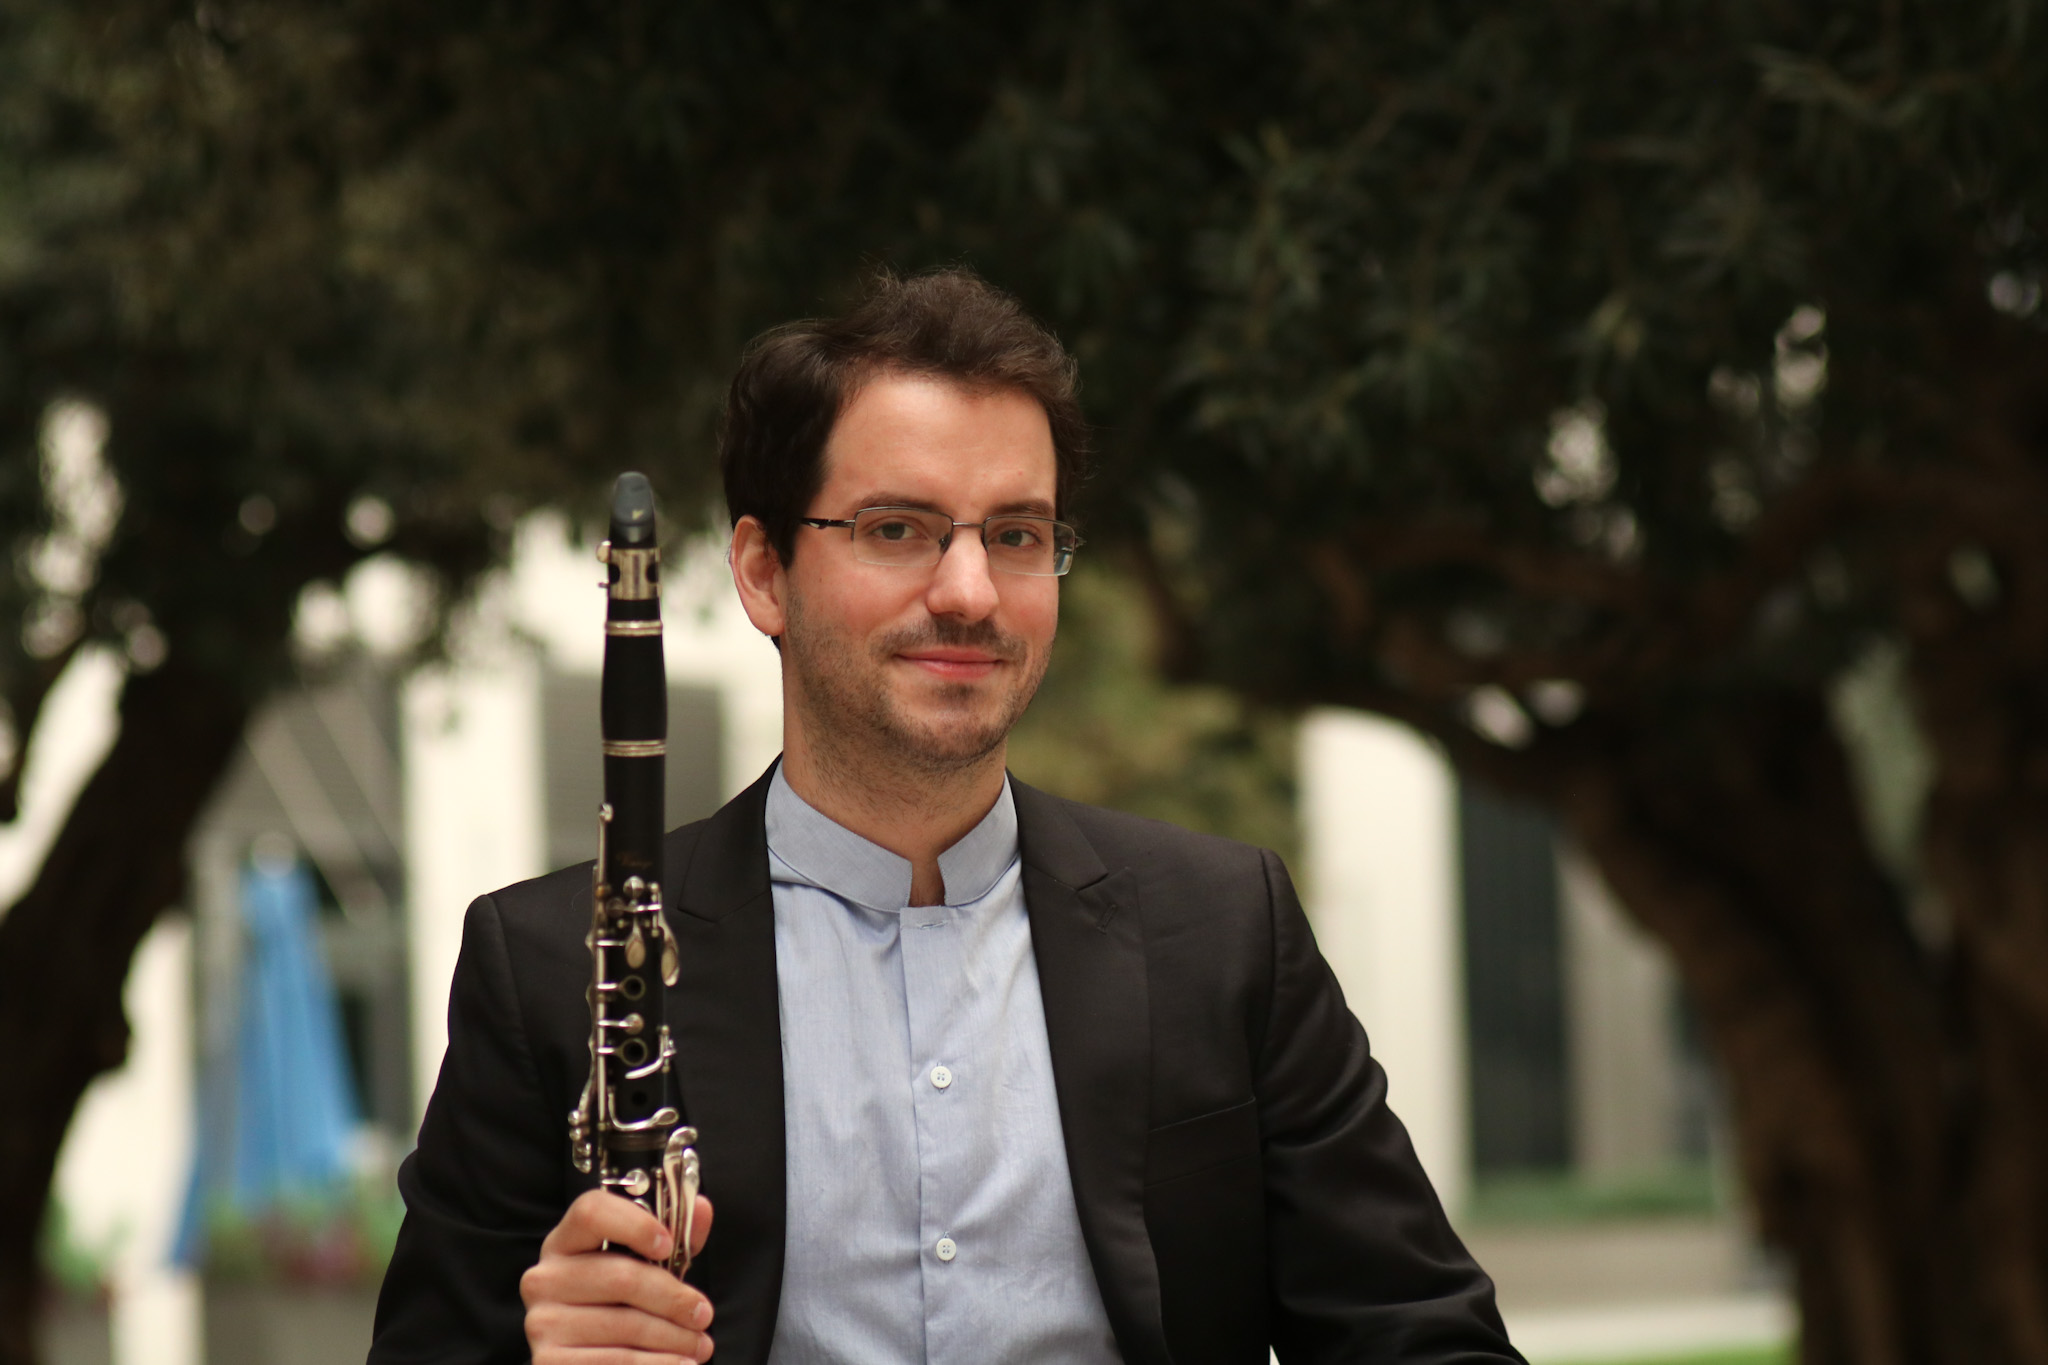 Musician Spotlight: Sérgio Coelho, Principal Clarinet